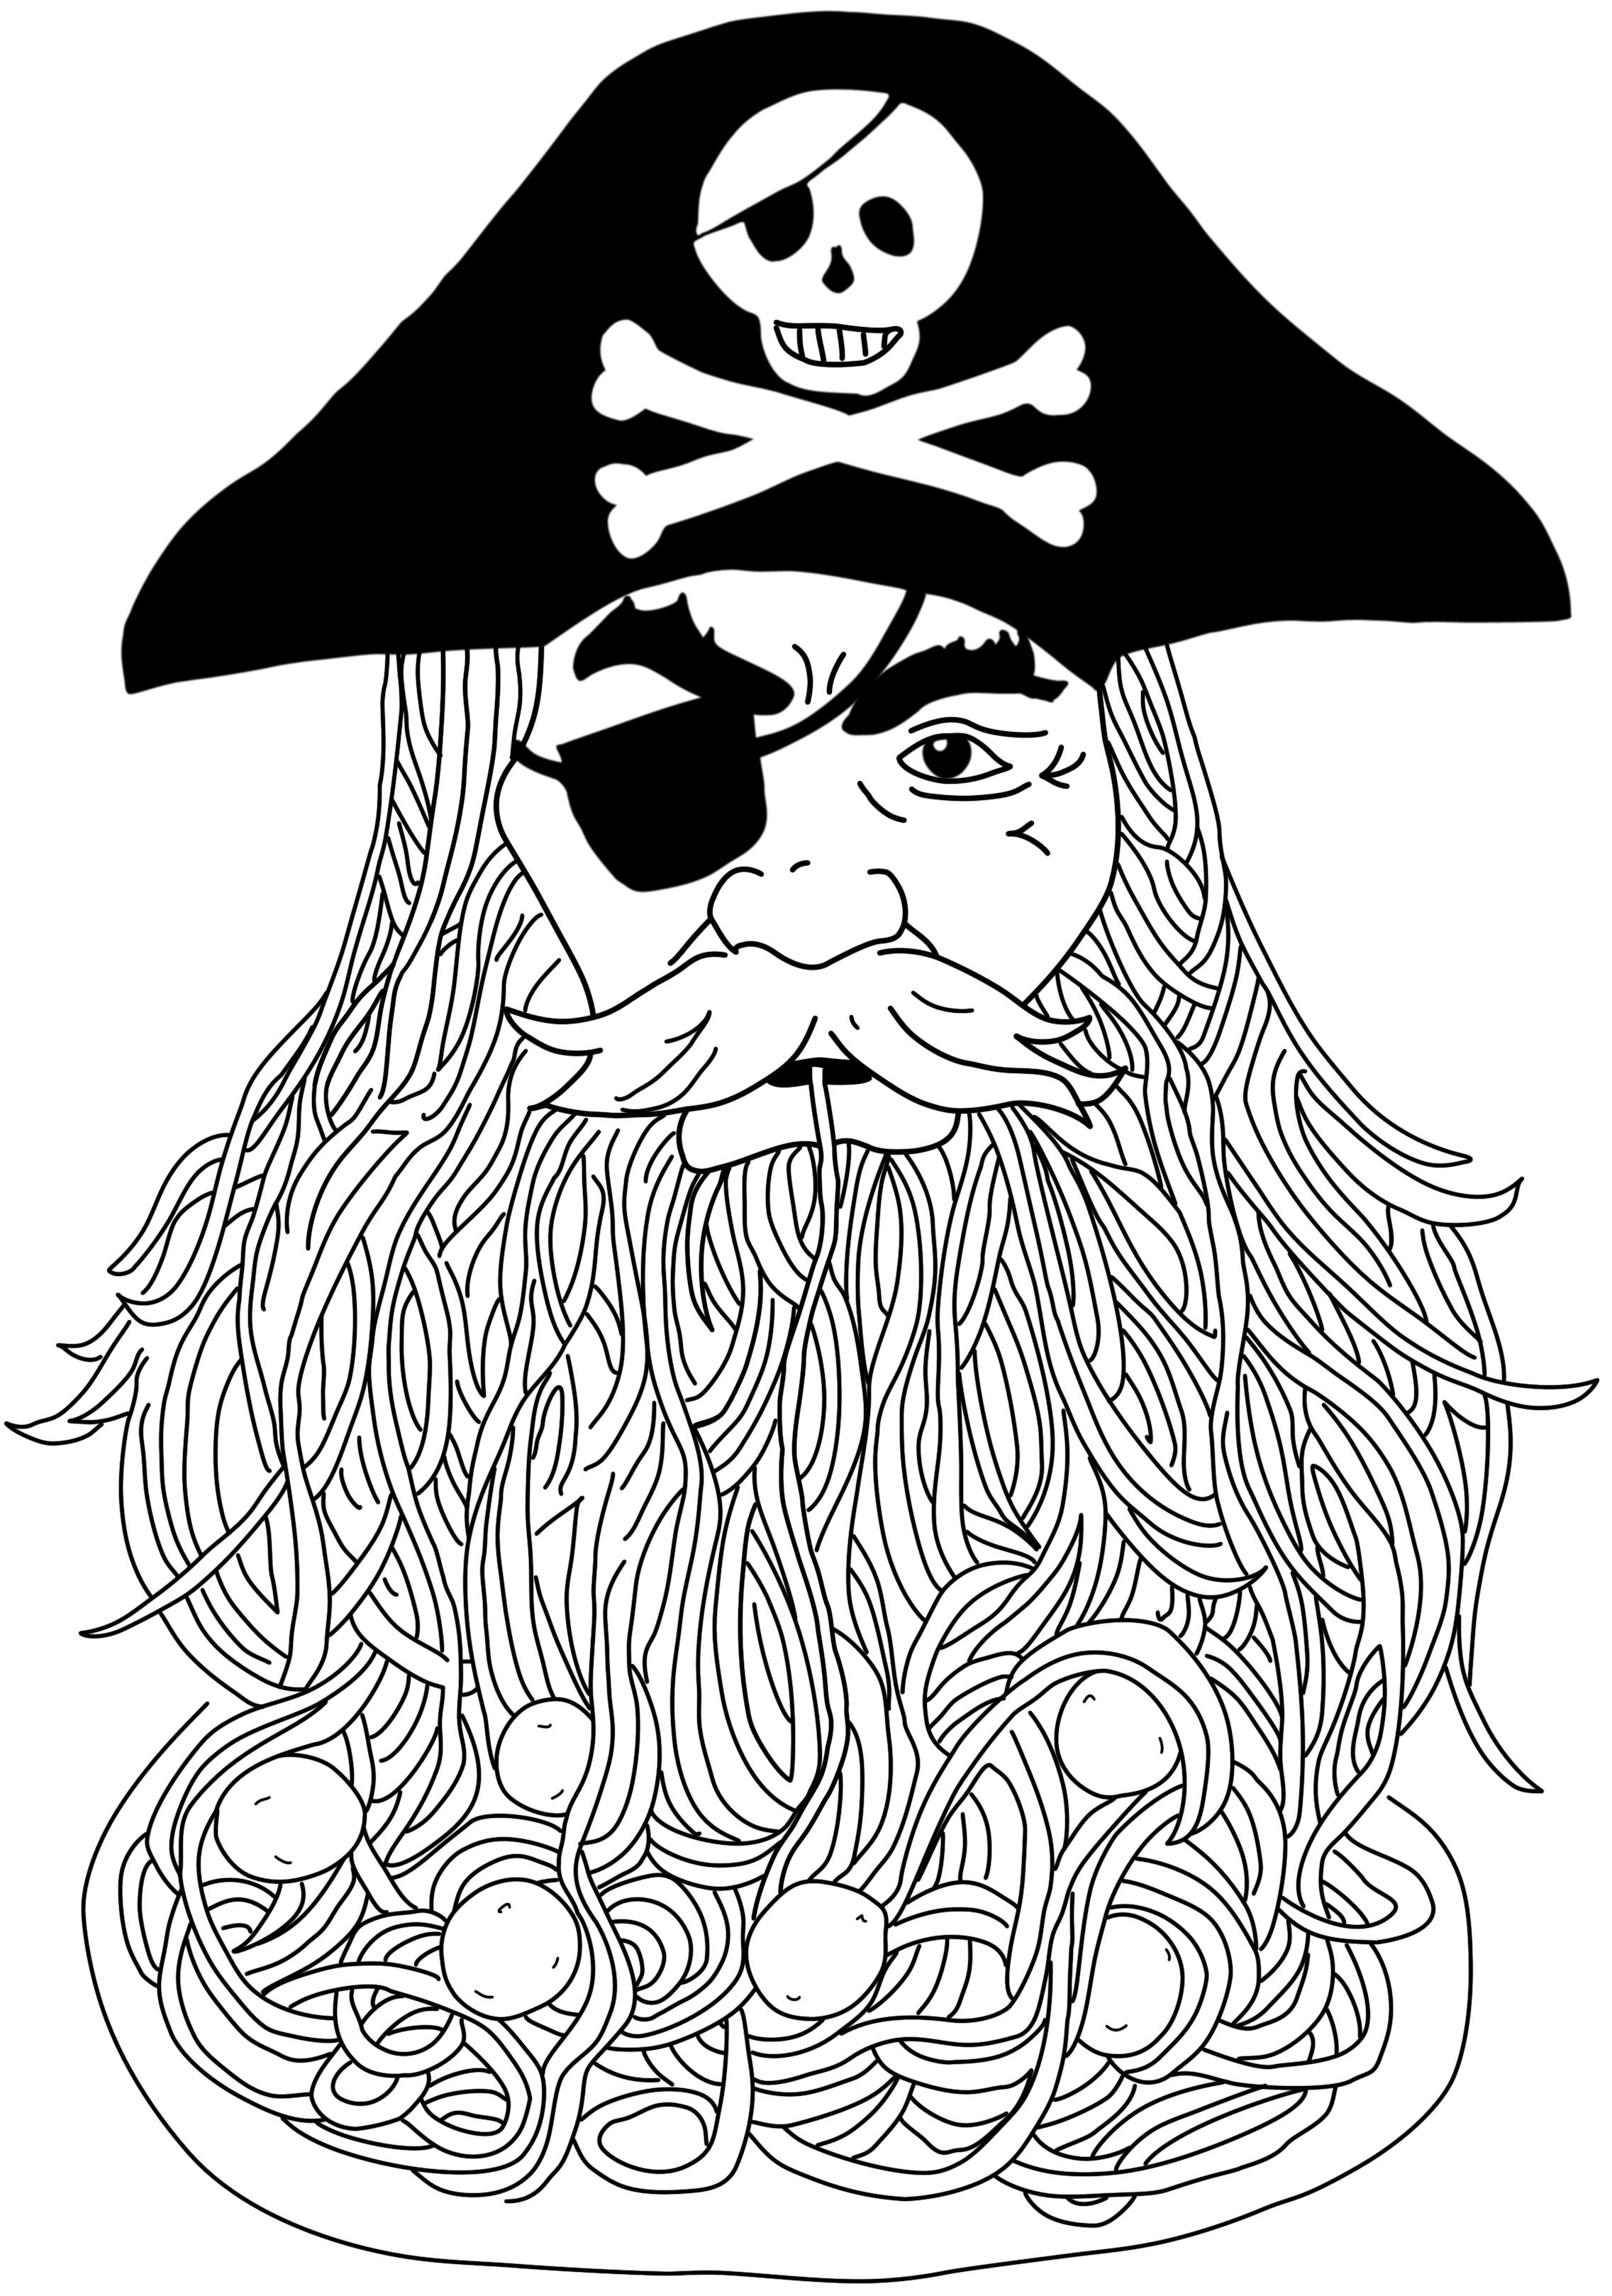 Beard Drawings Pirate Spaghetti Beard